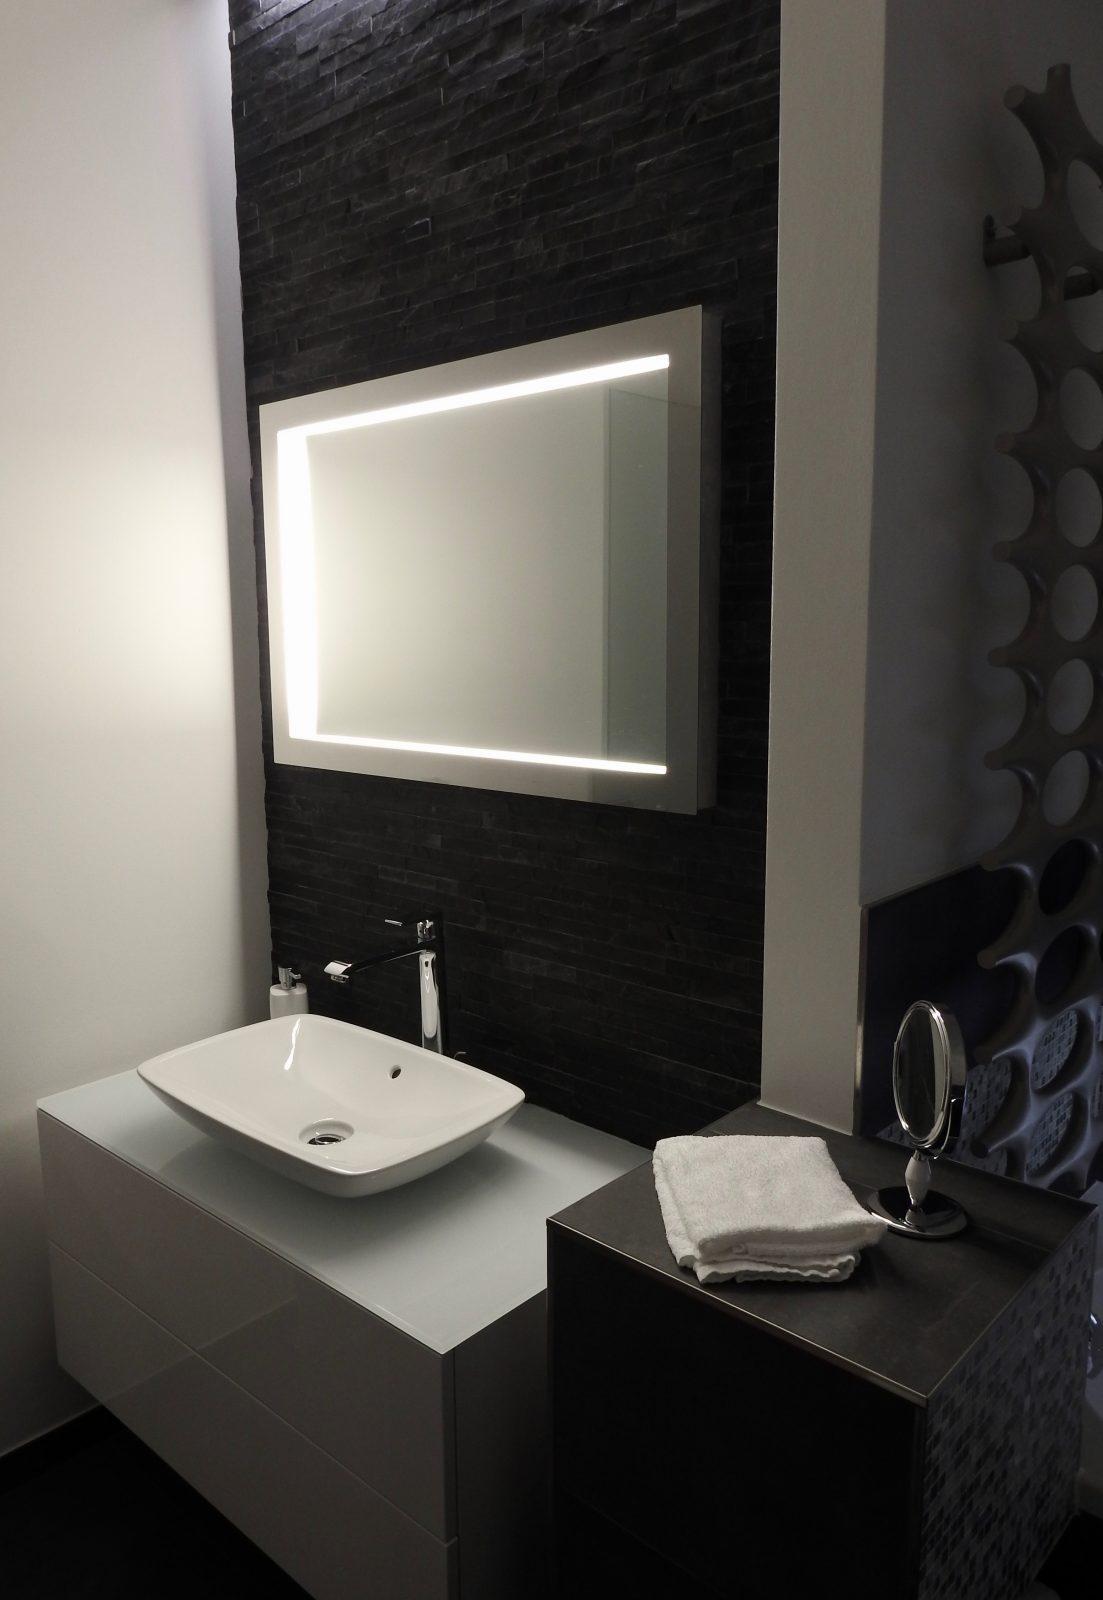 inspirationen neumann gmbh m nchen haustechnik fliesen badgestaltung. Black Bedroom Furniture Sets. Home Design Ideas